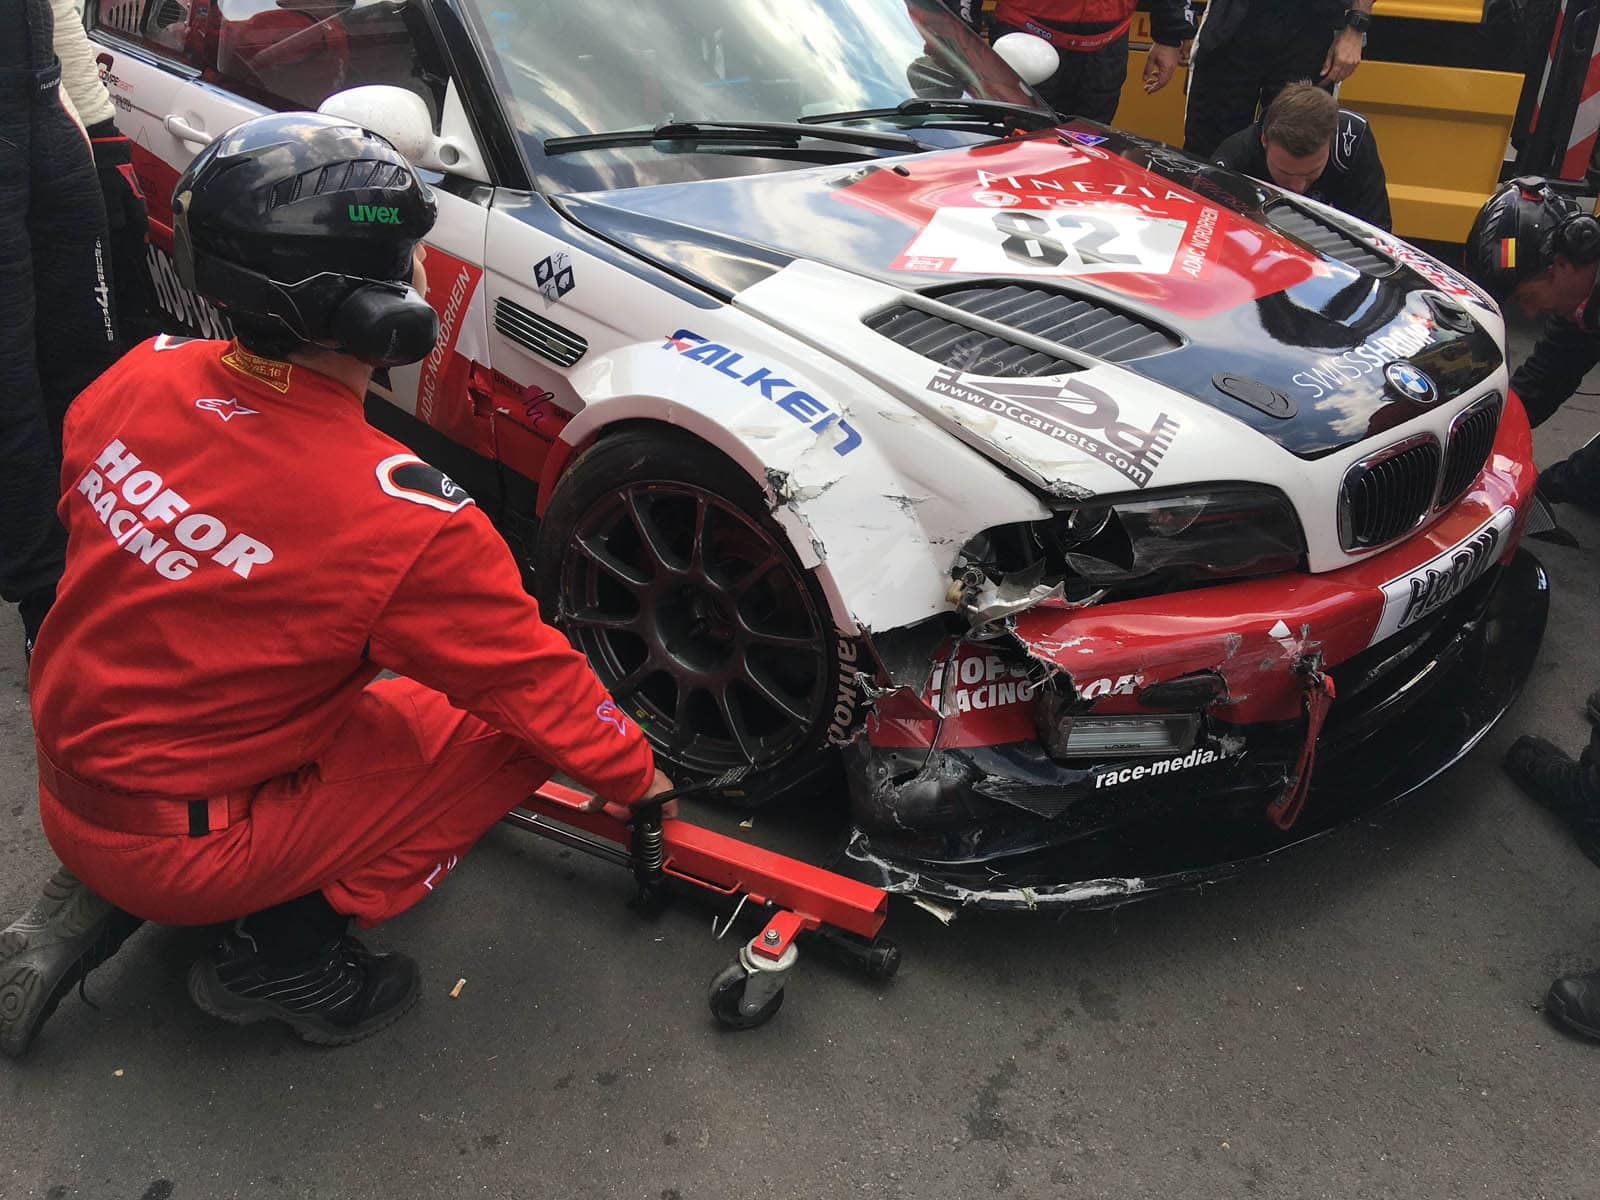 IMG 2046 - 21.-23. Juni 2019 – ADAC TOTAL 24h Rennen – Nürburgring / DE